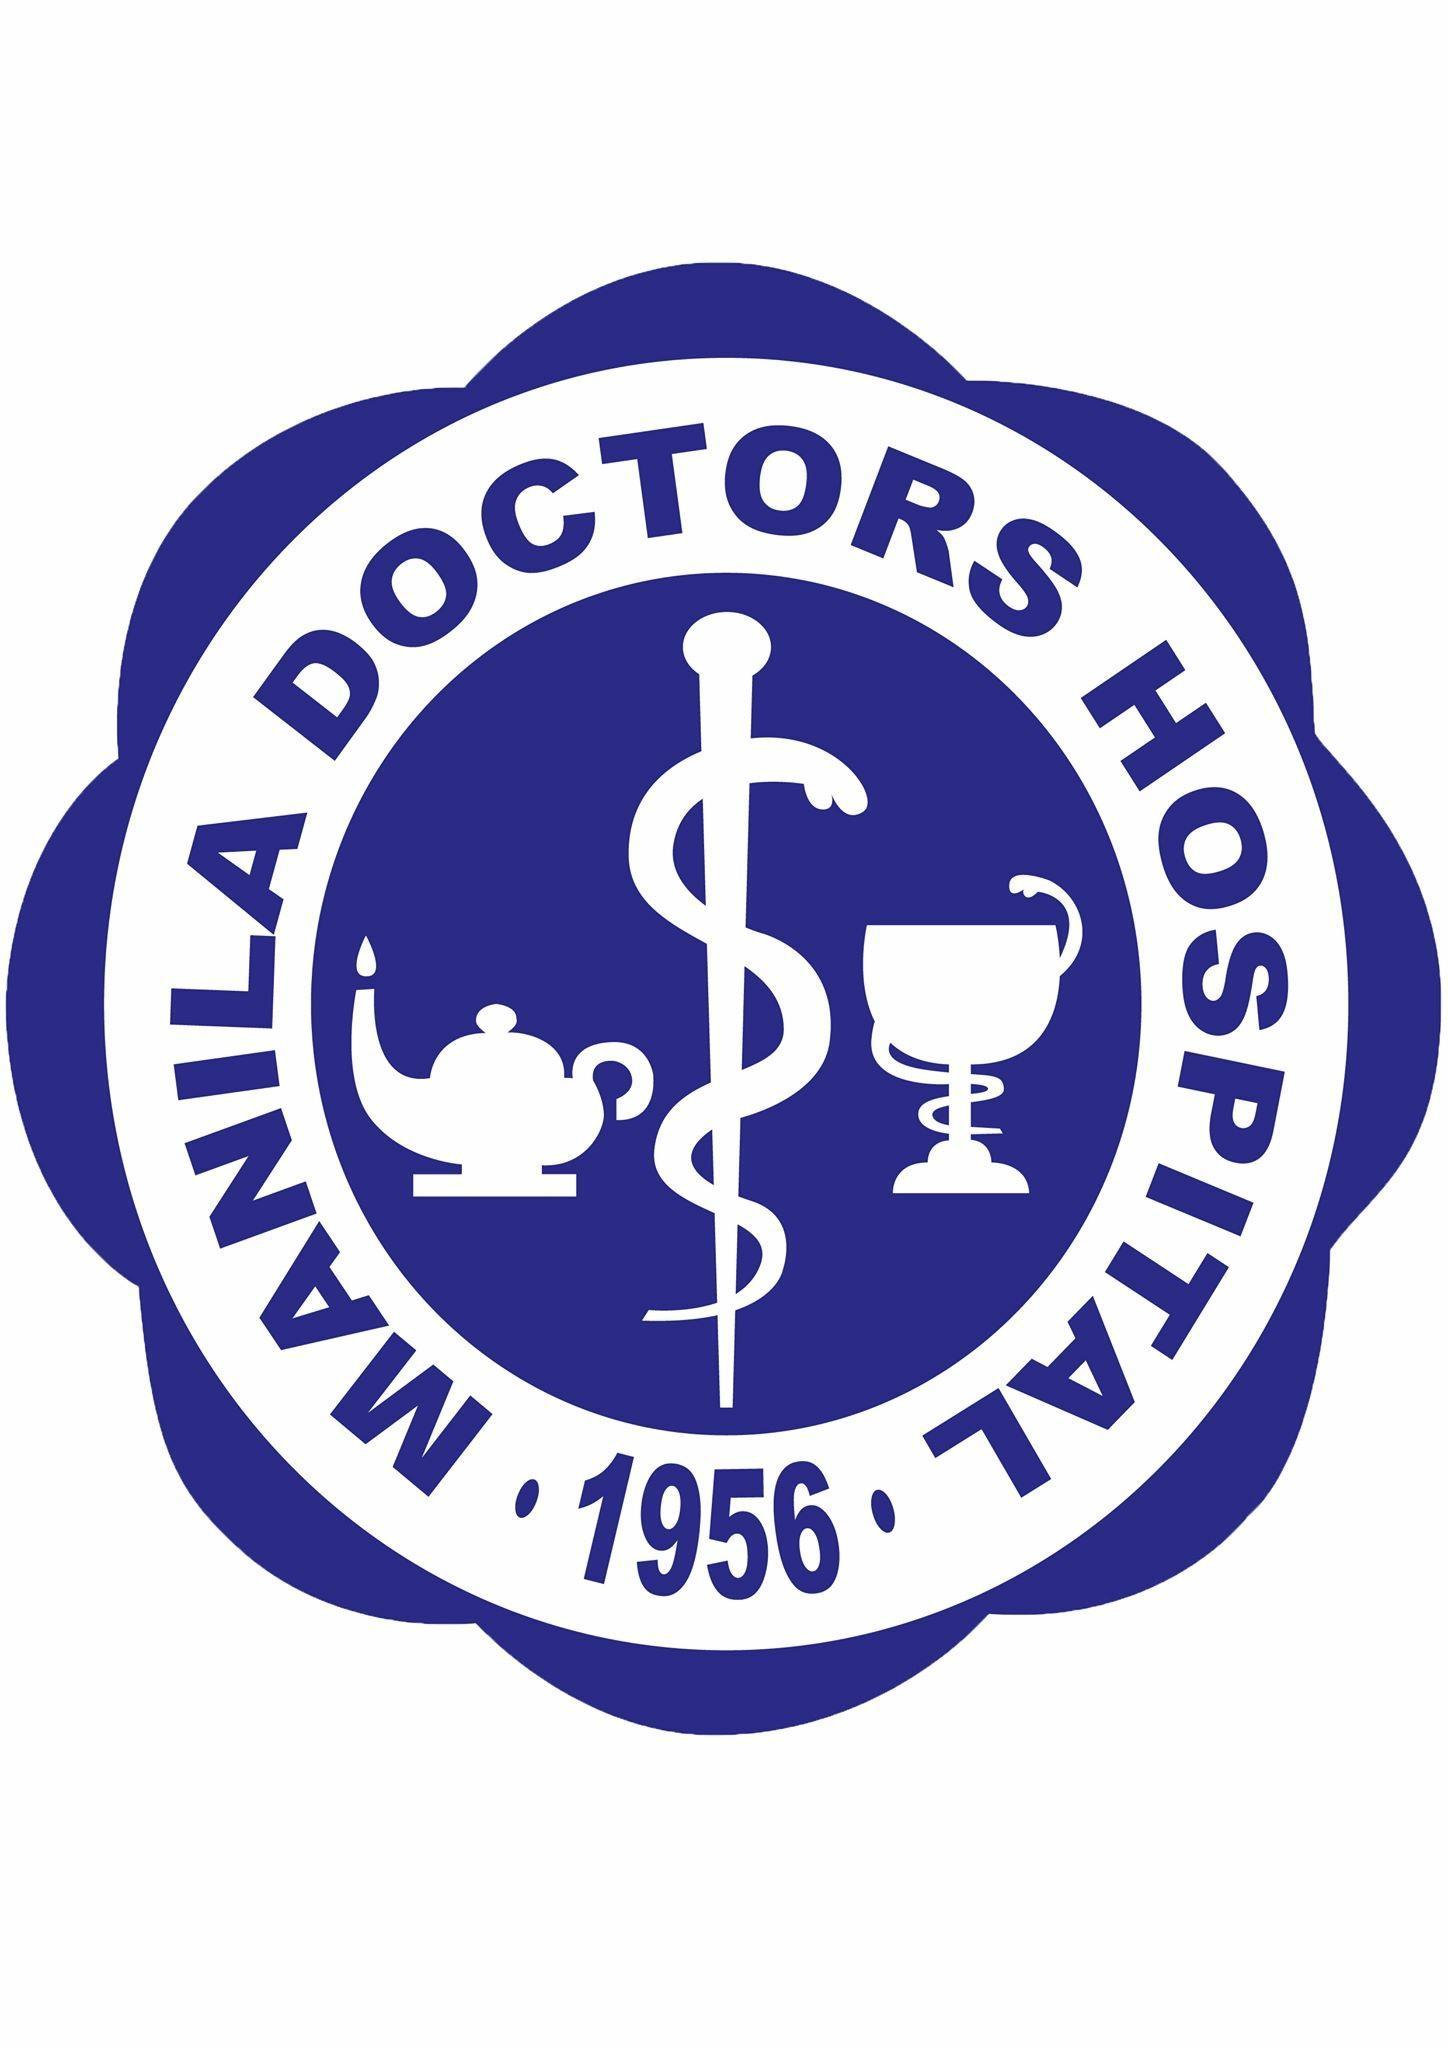 Manila Doctors Hospital - Room No. 312